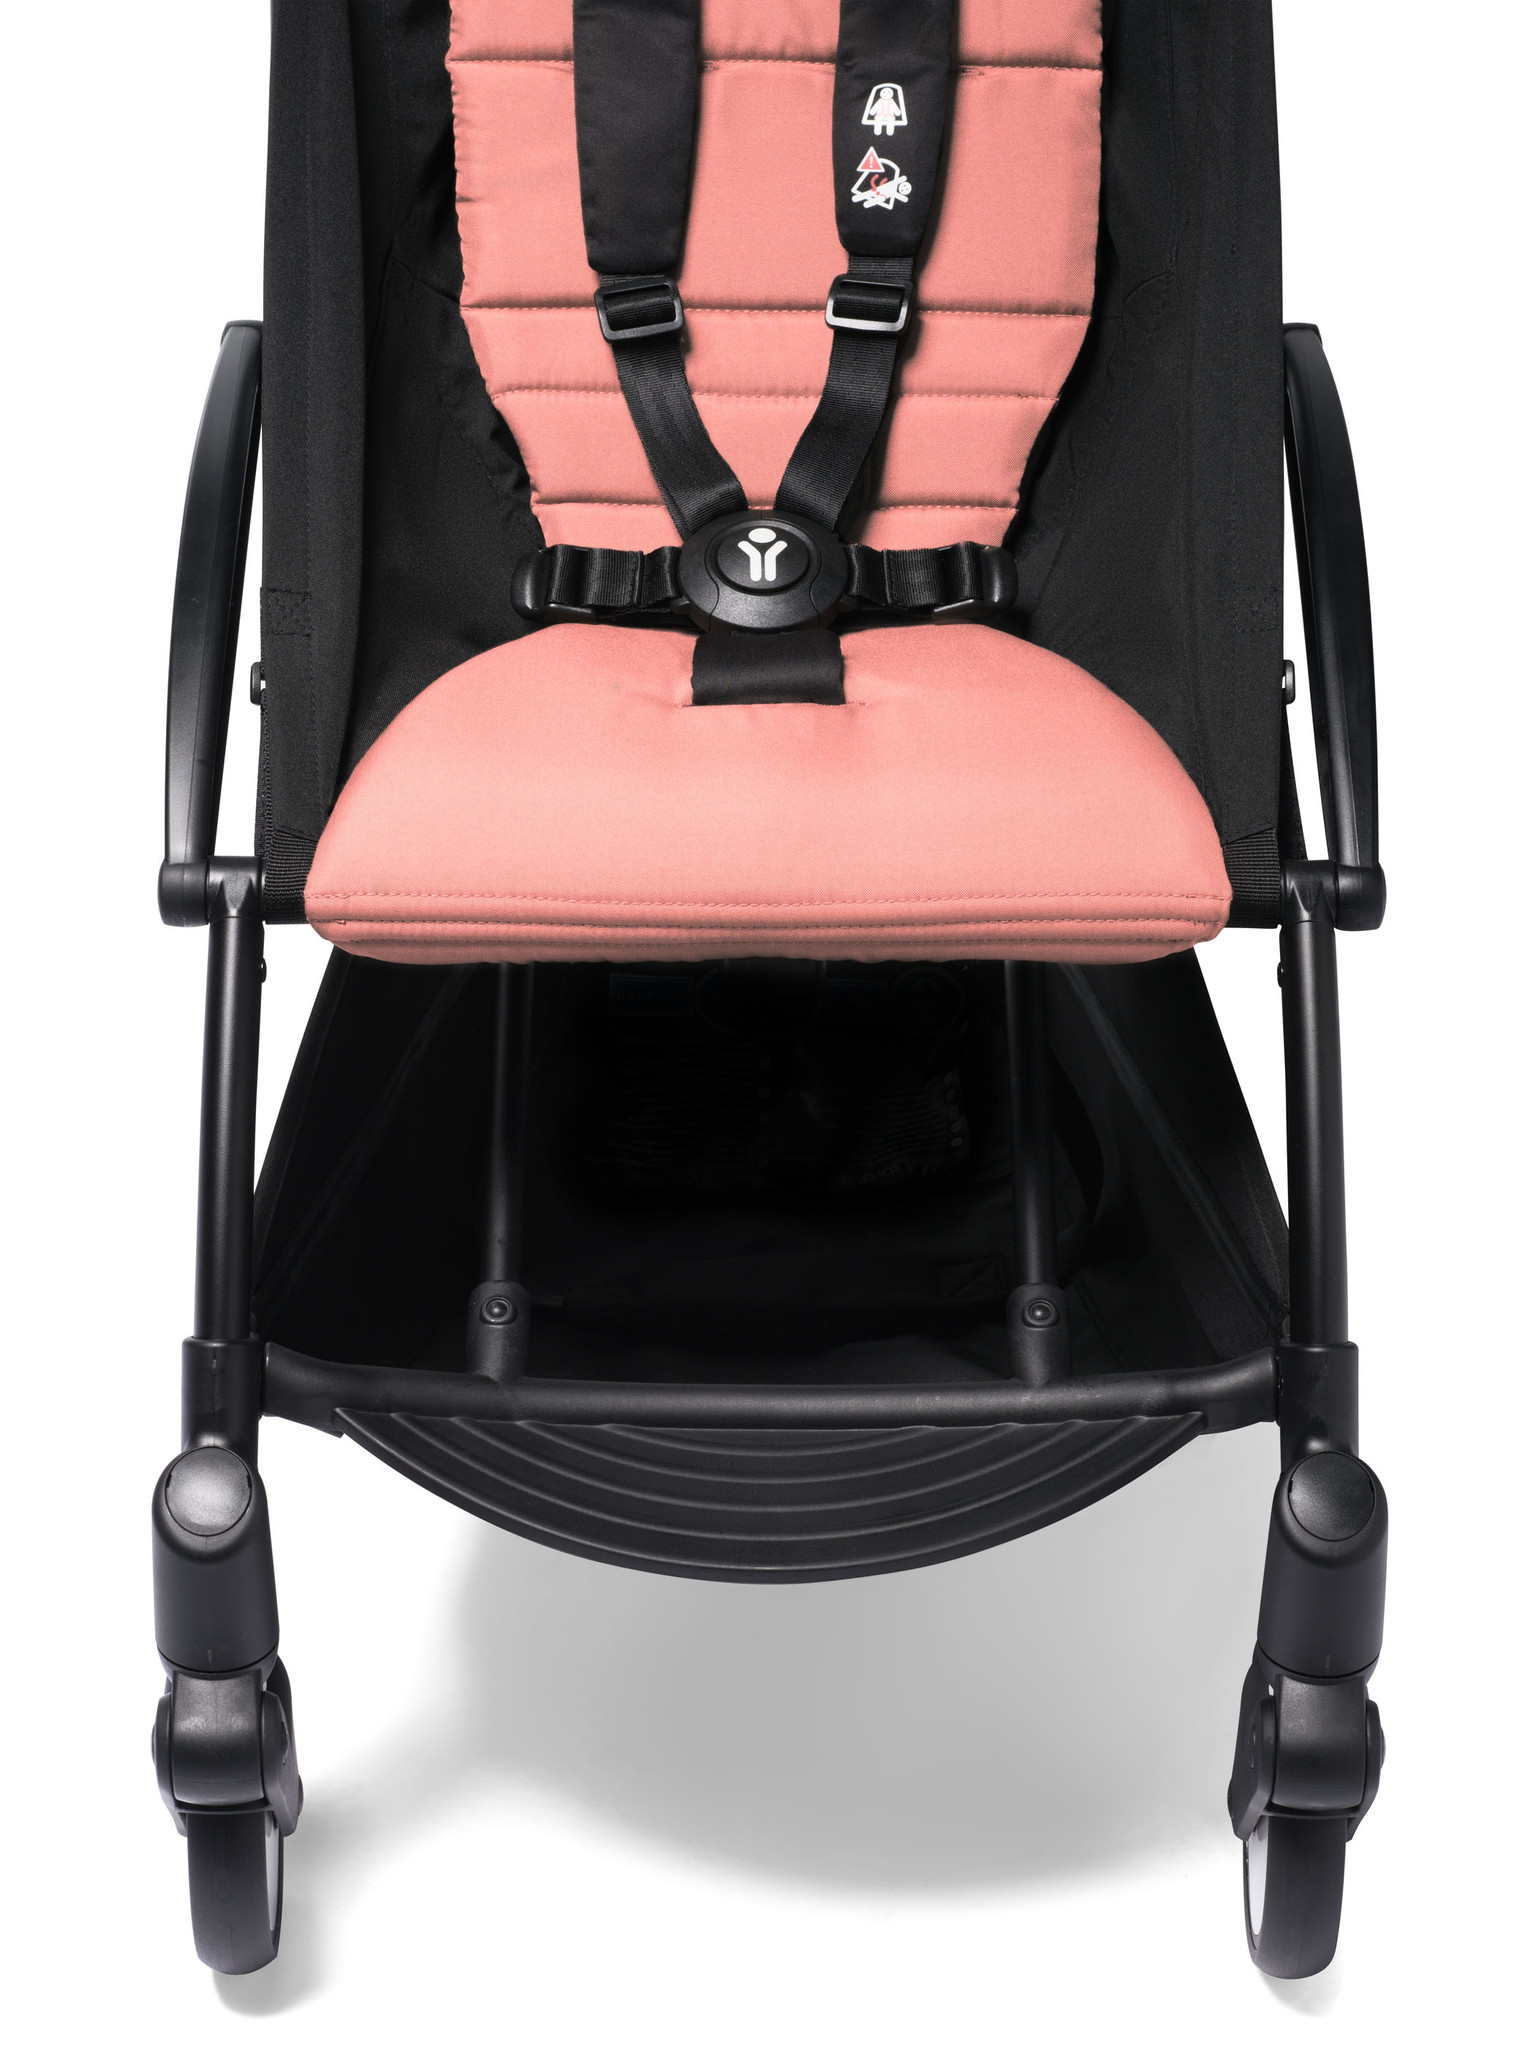 Babyzen Babyzen YOYO² buggy COMPLEET / FULL SET 0+ and 6+ ginger frame wit incl. YOYO² BeSafe autostoel zwart